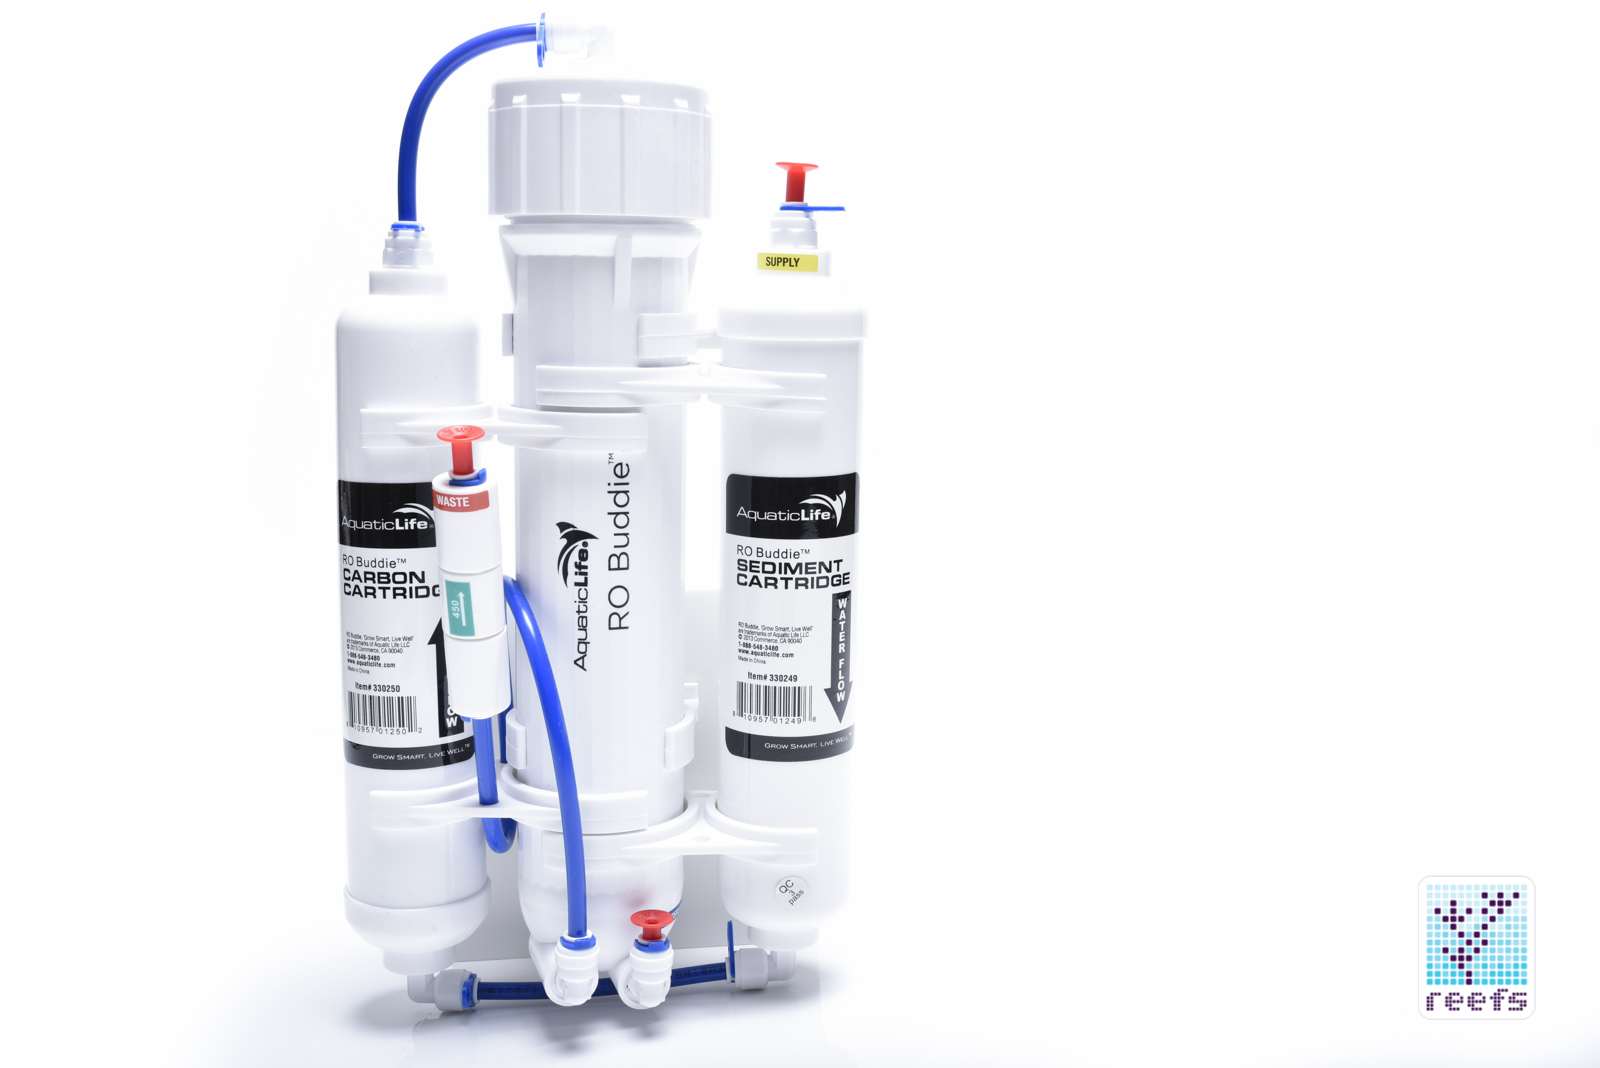 Reverse Osmosis & Deionization Aquatic Life Aquatic Life Smart Buddie Booster Pump For 50-100 Gpd Reverse Osmos Grade Products According To Quality